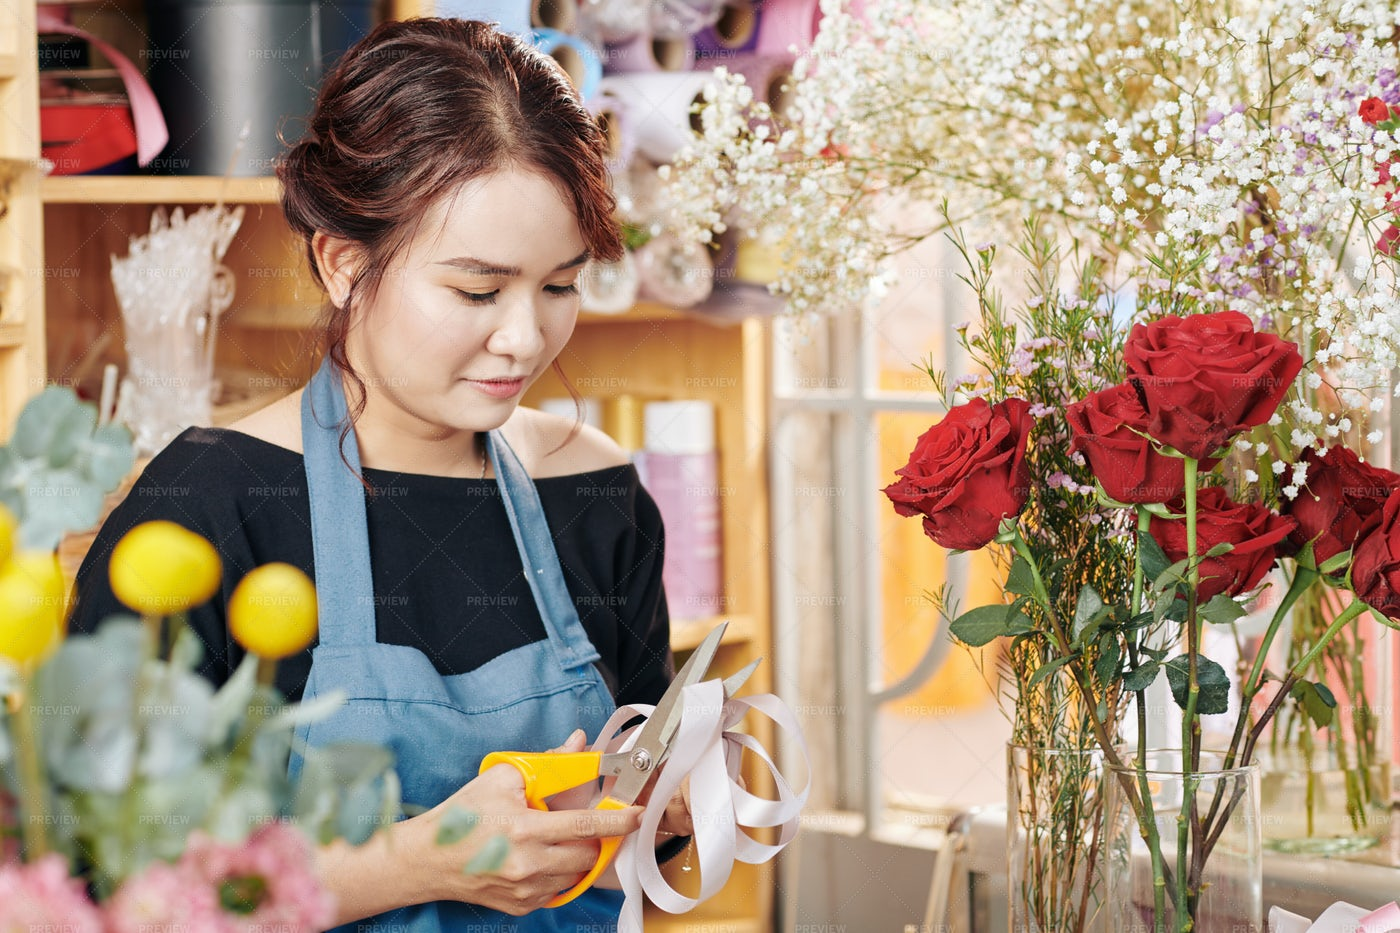 Young Florist Cutting Ribbon For: Stock Photos